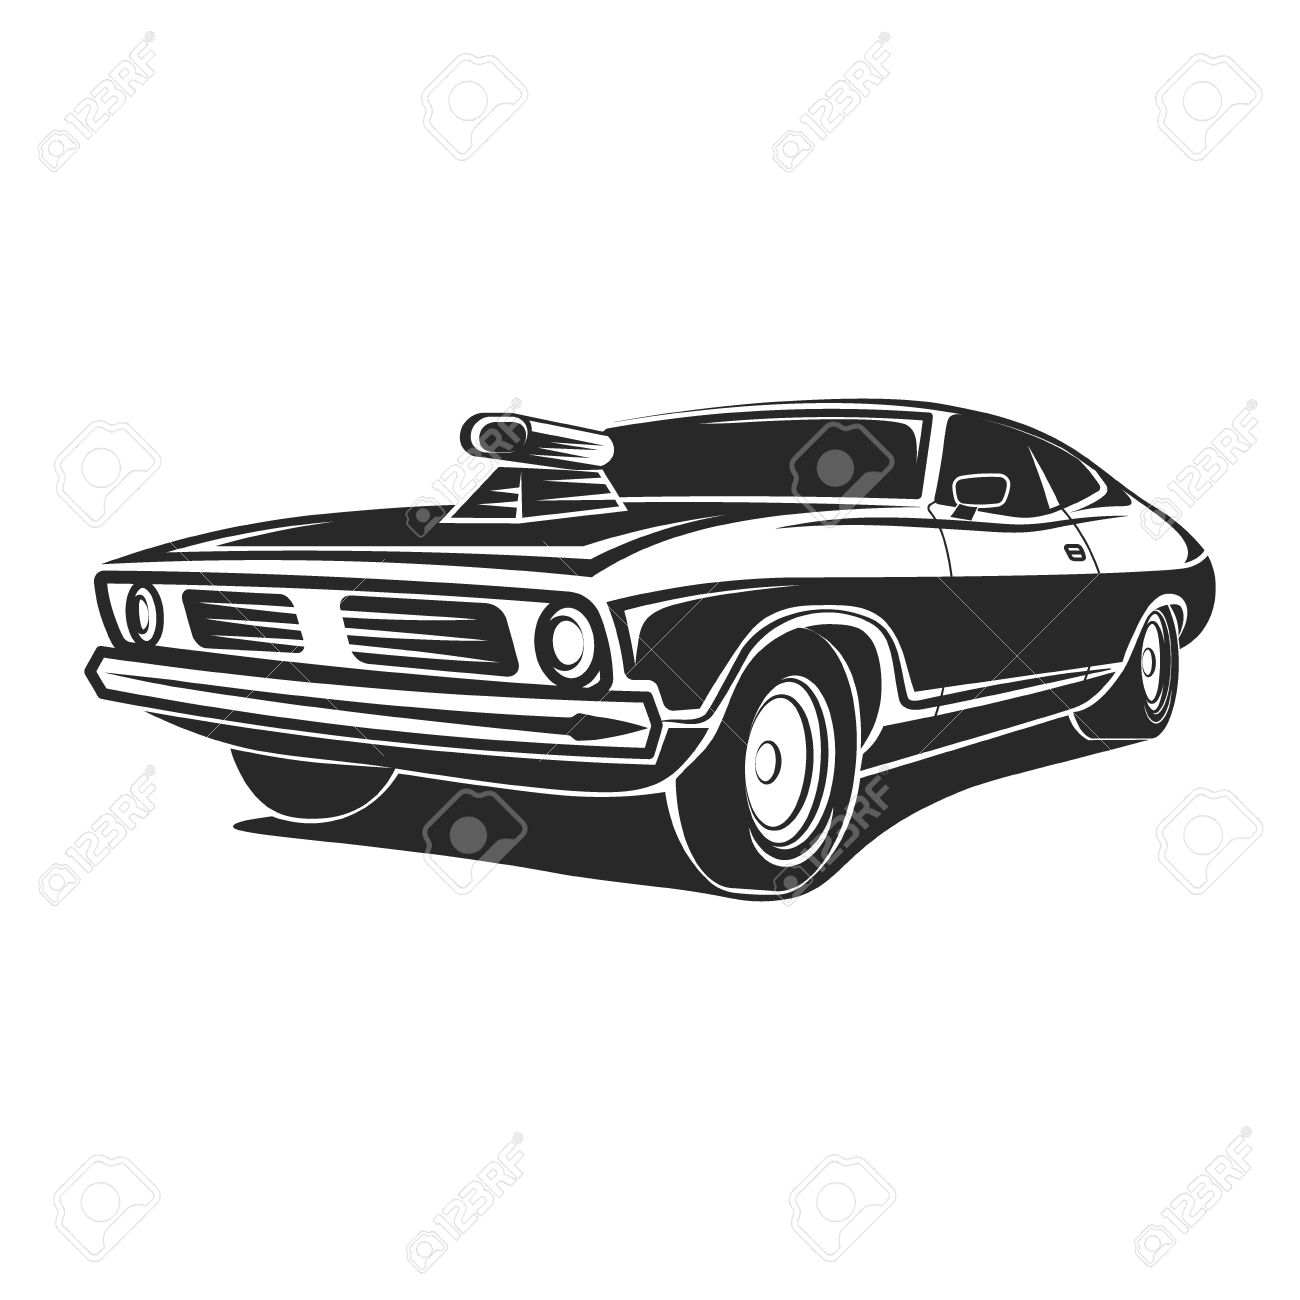 muscle car vector art poster t shirt illustration royalty free rh 123rf com Classic Car Outline Clip Art Mustang Car Clip Art